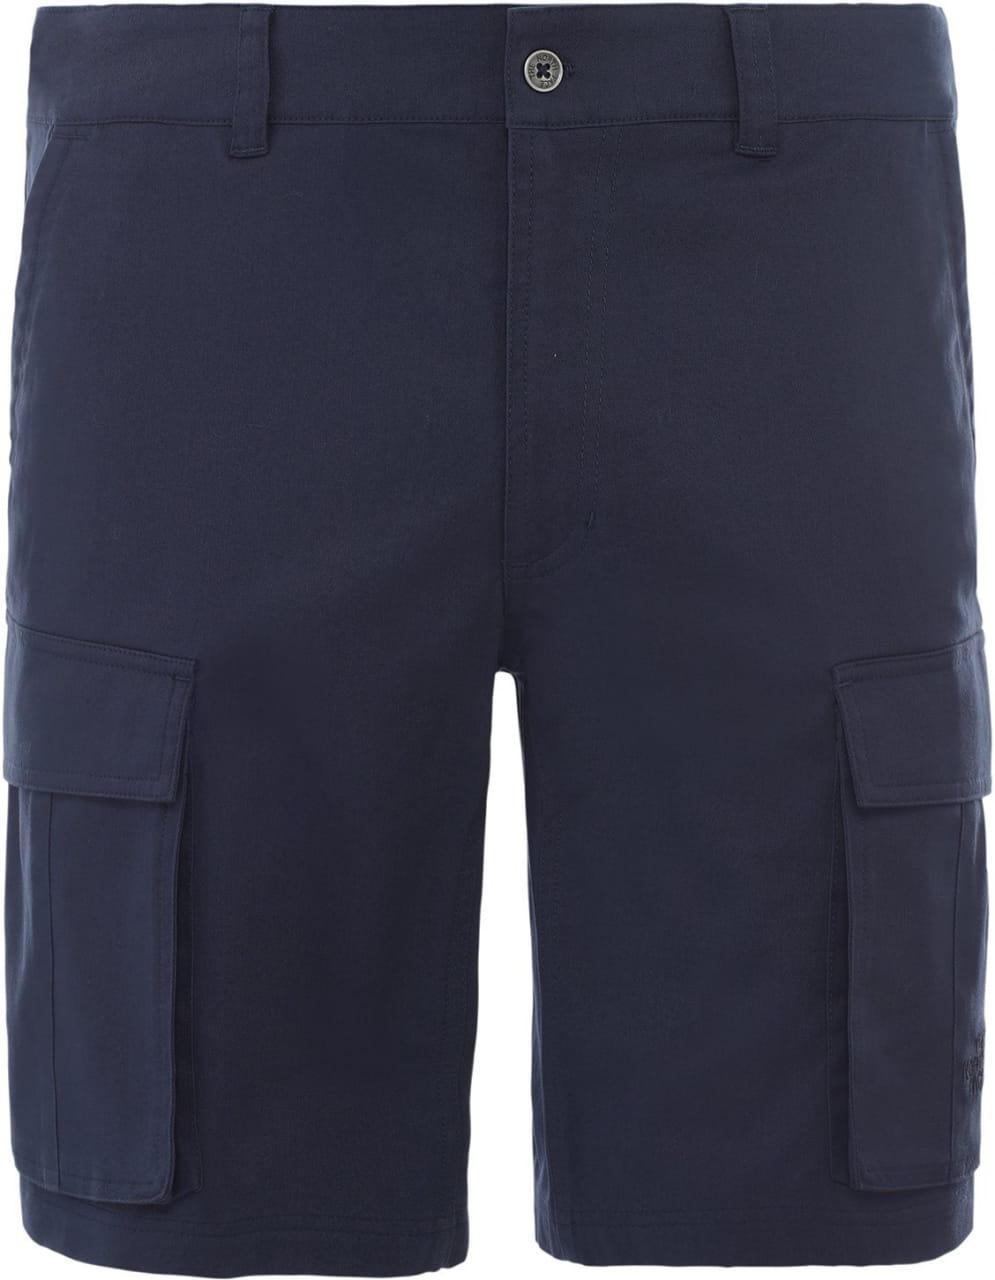 Shorts The North Face Men's Anticline Cargo Shorts